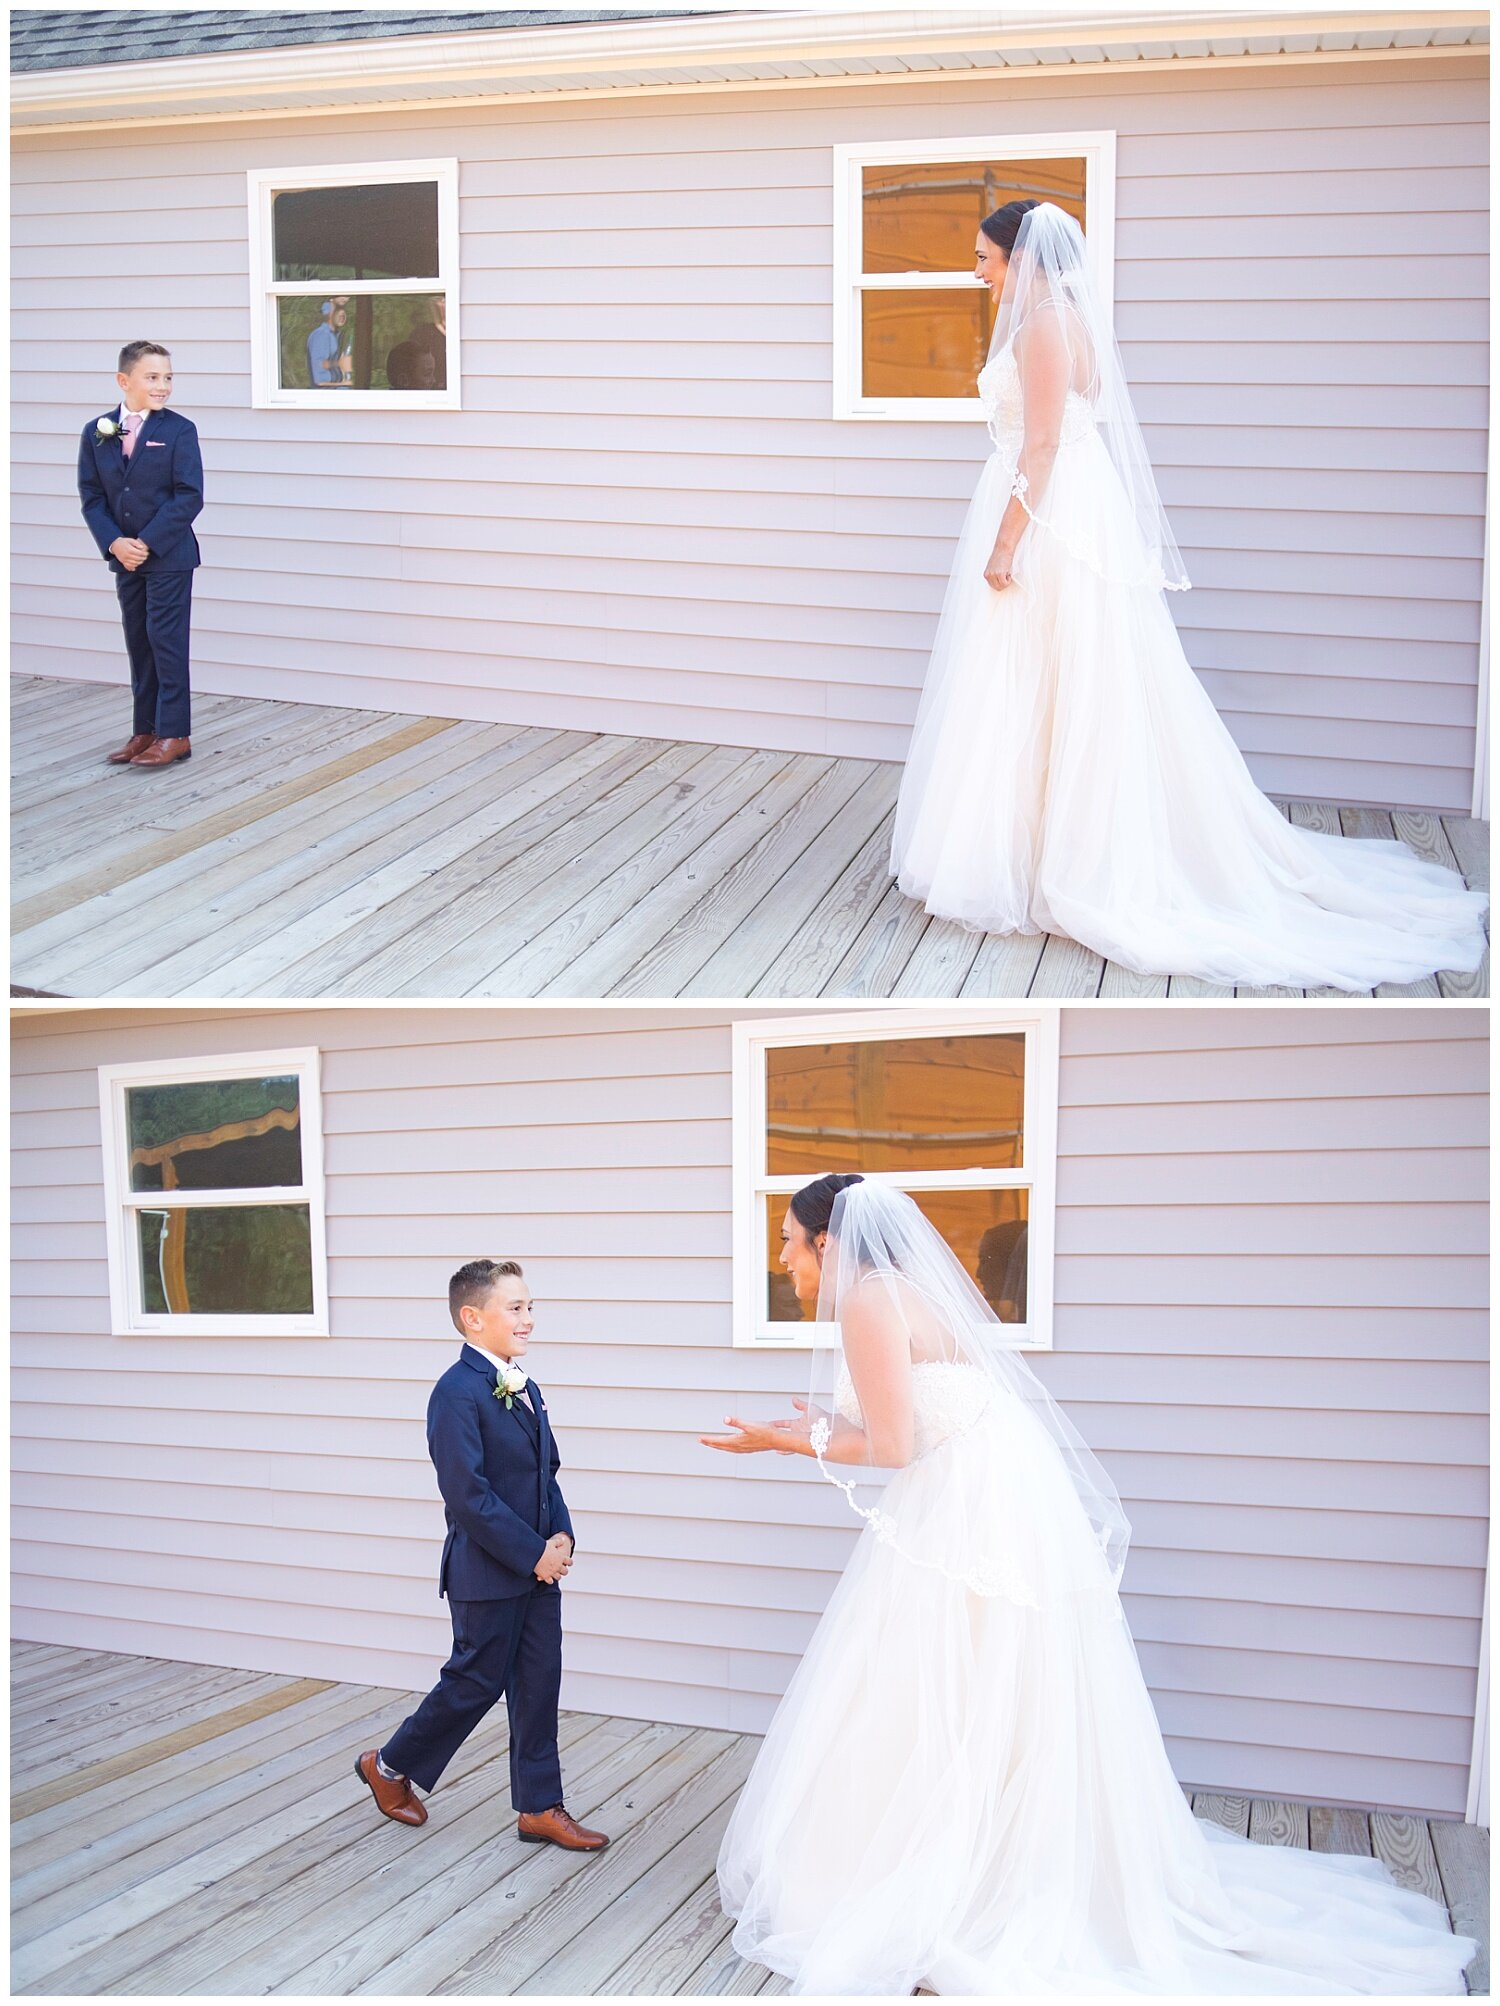 MJMP Richmond VA Wedding Photographer The Venue at Orchard View Farm Wedding Photo_0023.jpg